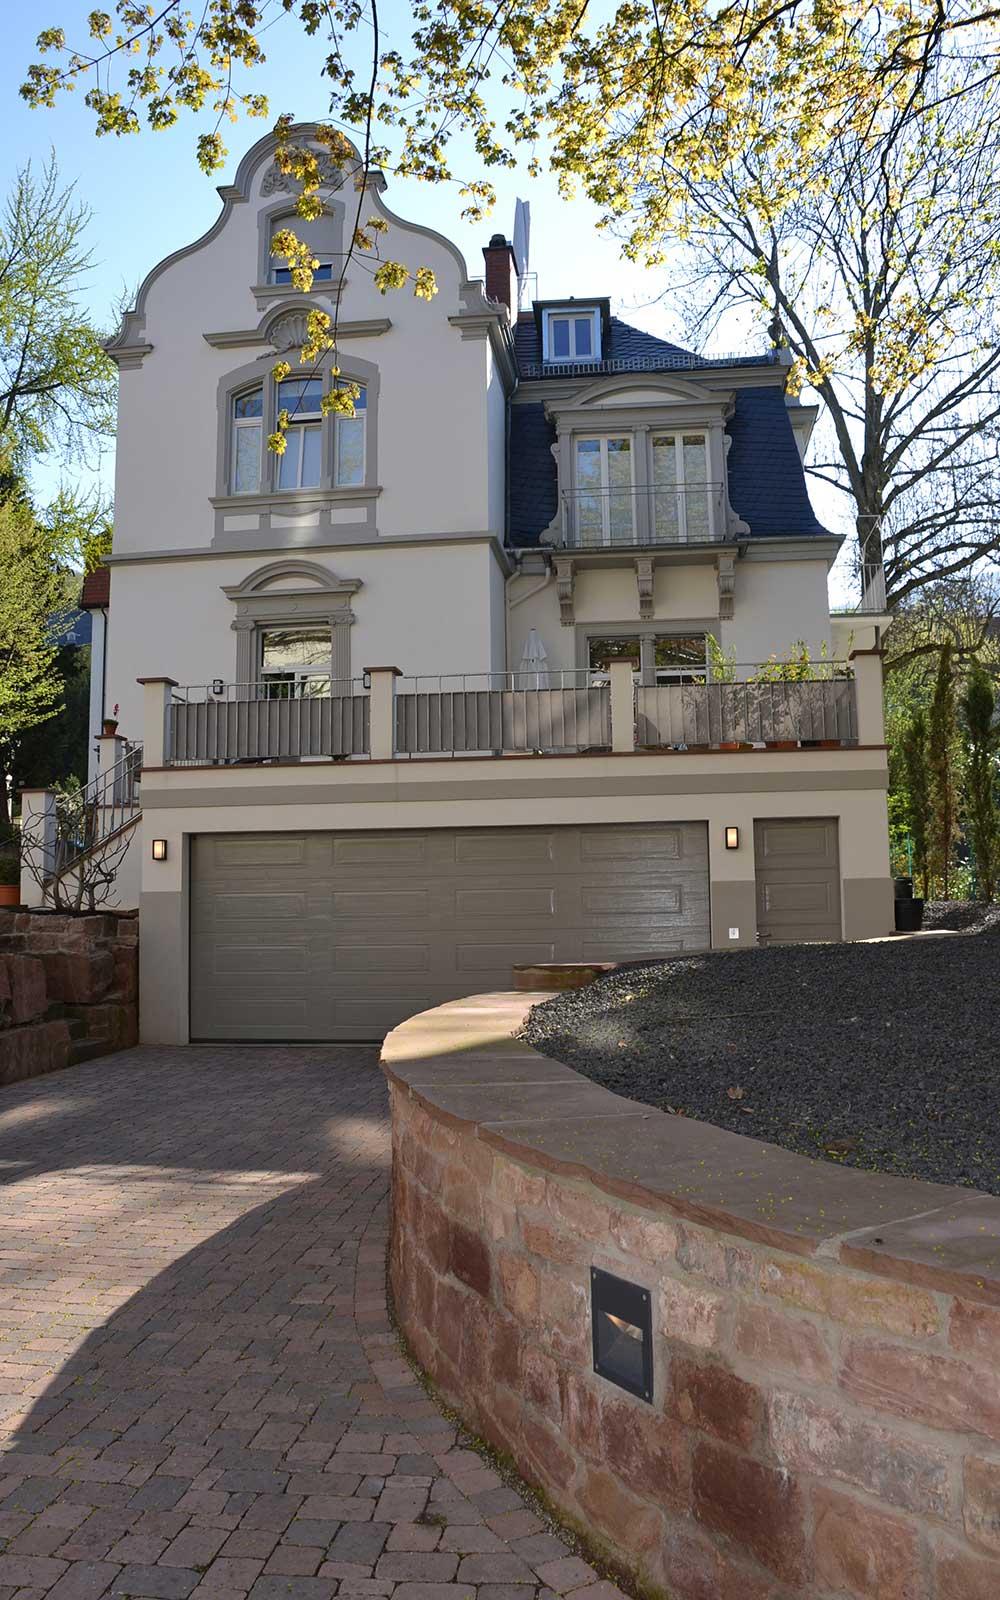 behaghelvilla kochhan weckbach architekten heidelberg. Black Bedroom Furniture Sets. Home Design Ideas